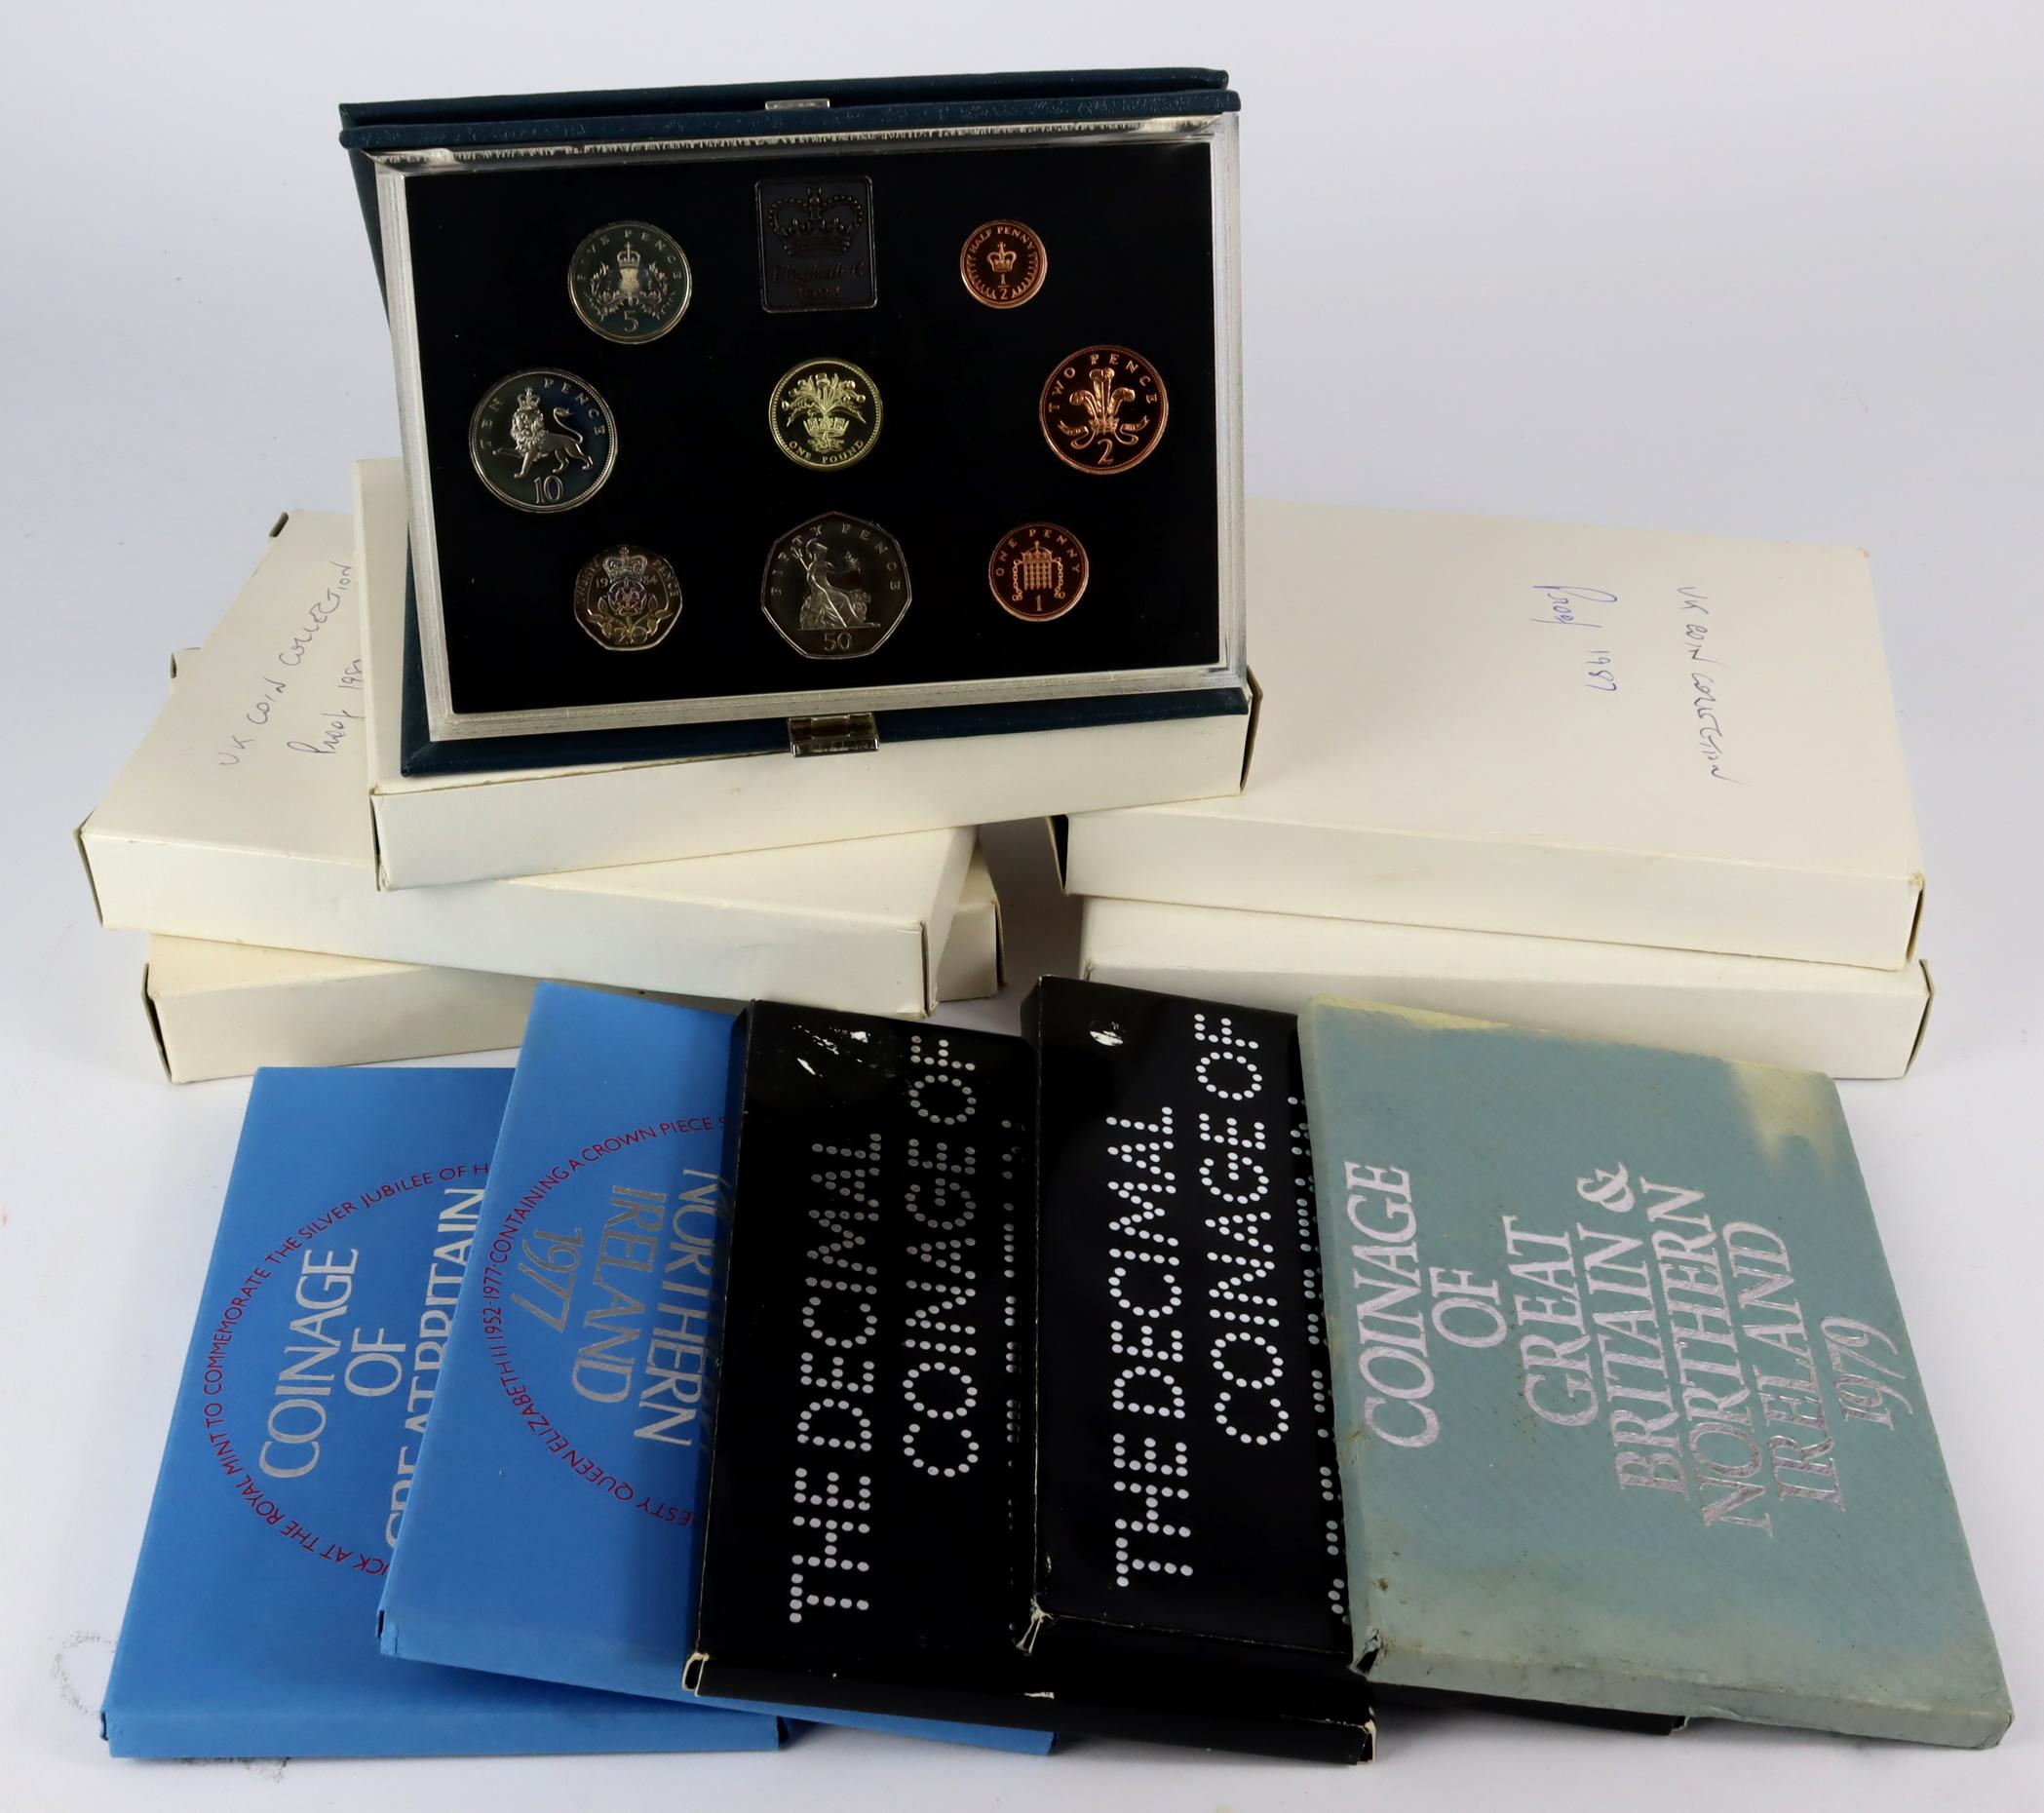 UK Proof Sets (10): Flat packs: 1971 x2, 1977 x2, 1979. Standard blue: 1983, 1984, 1985, 1986, and